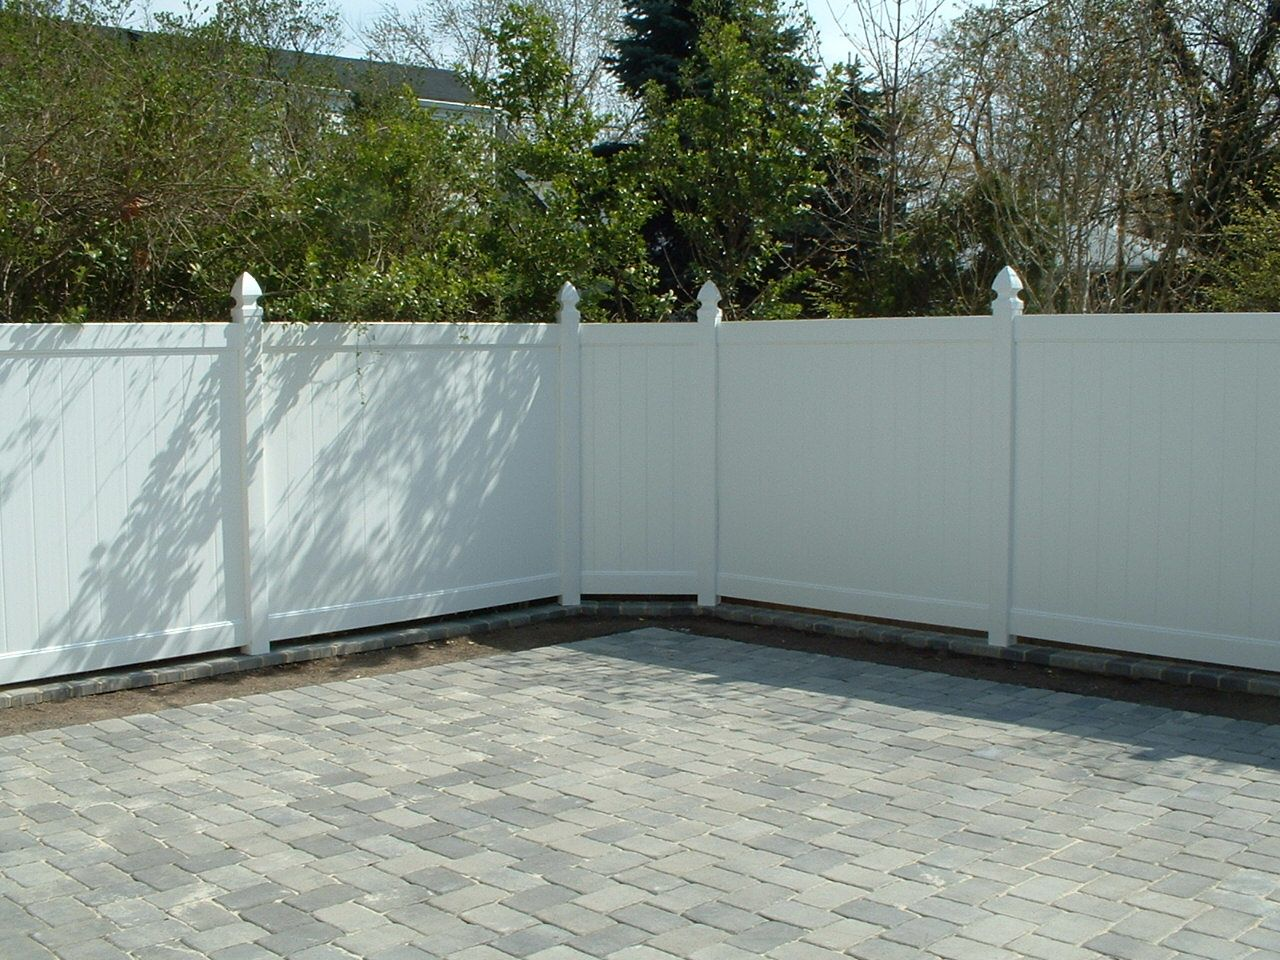 Pvc white fence attractive vinyl fencing morden styles best garden pvc fence supplies baanklon Gallery